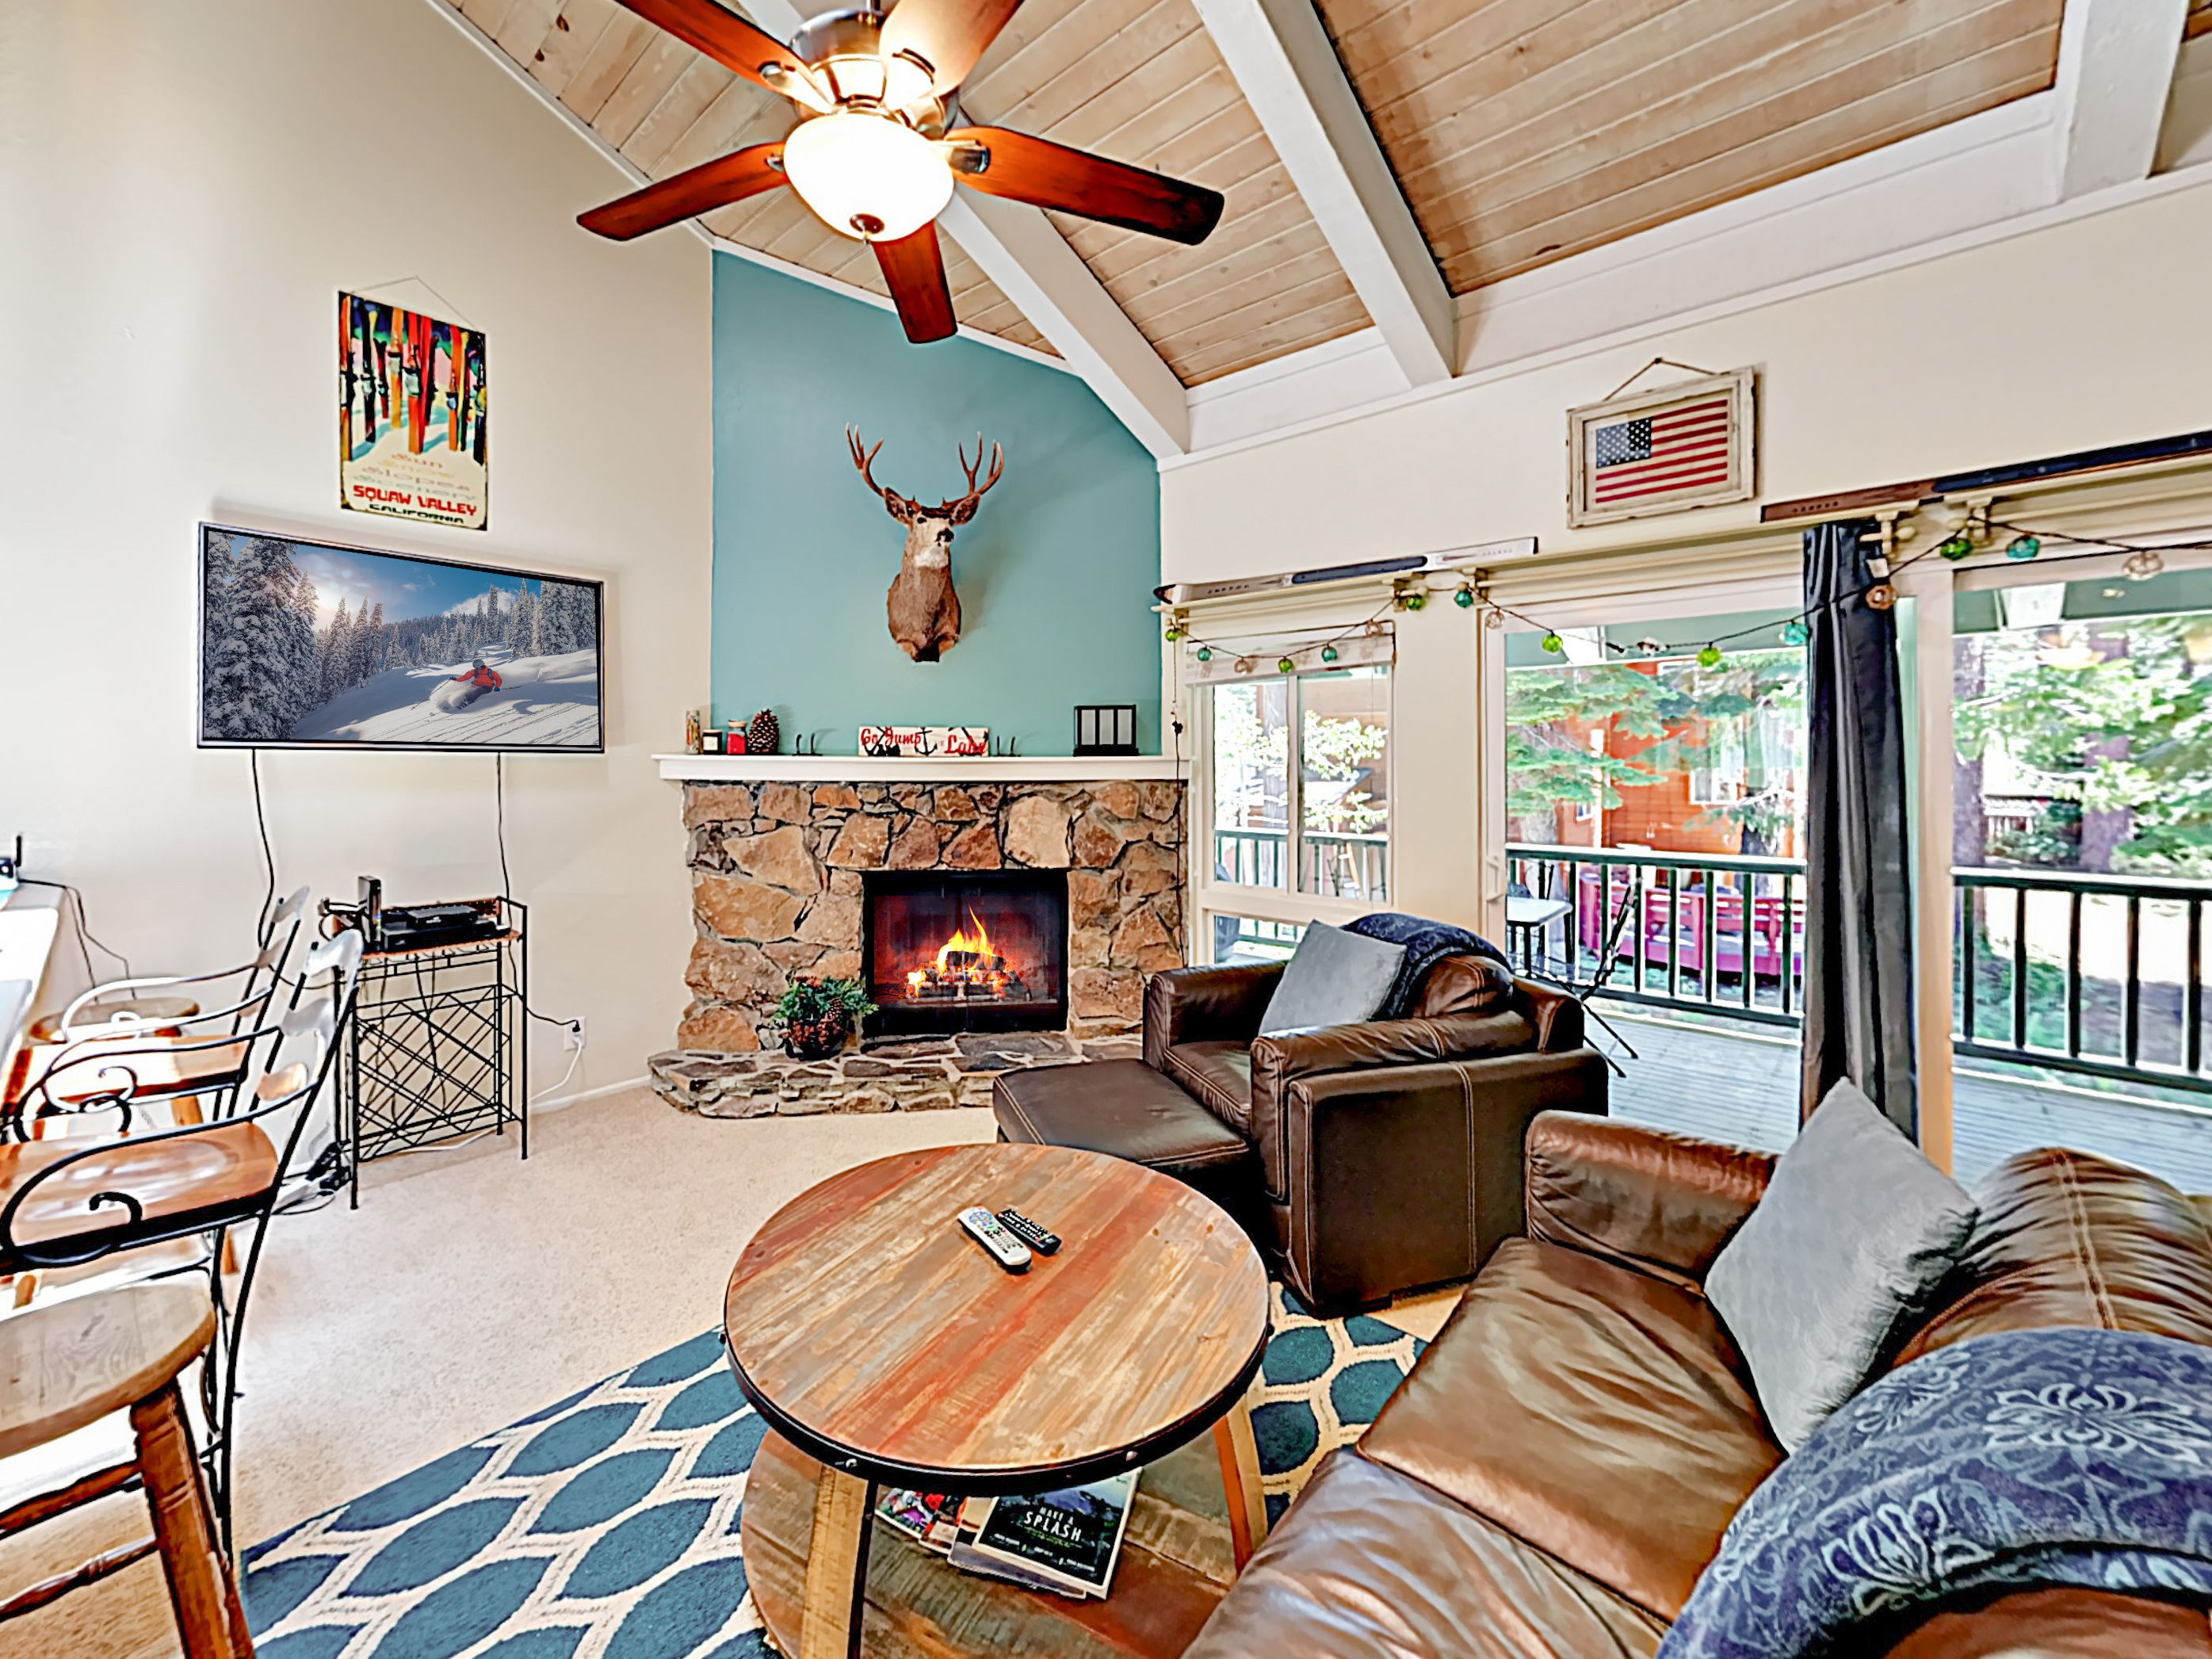 Tahoe City CA Vacation Rental Welcome to Tahoe